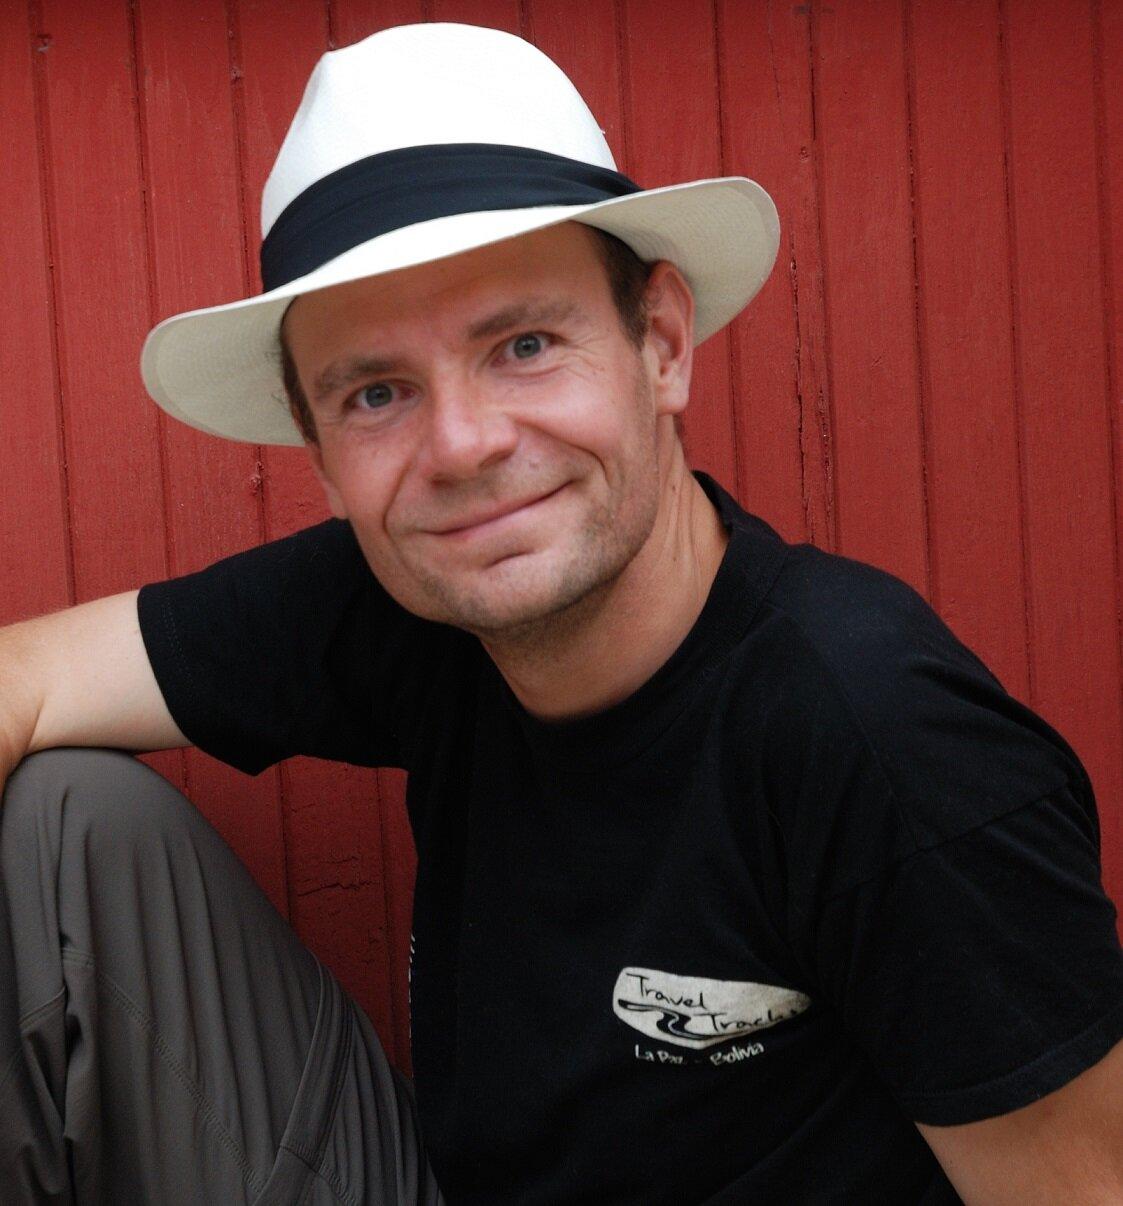 Lars Wanderlust